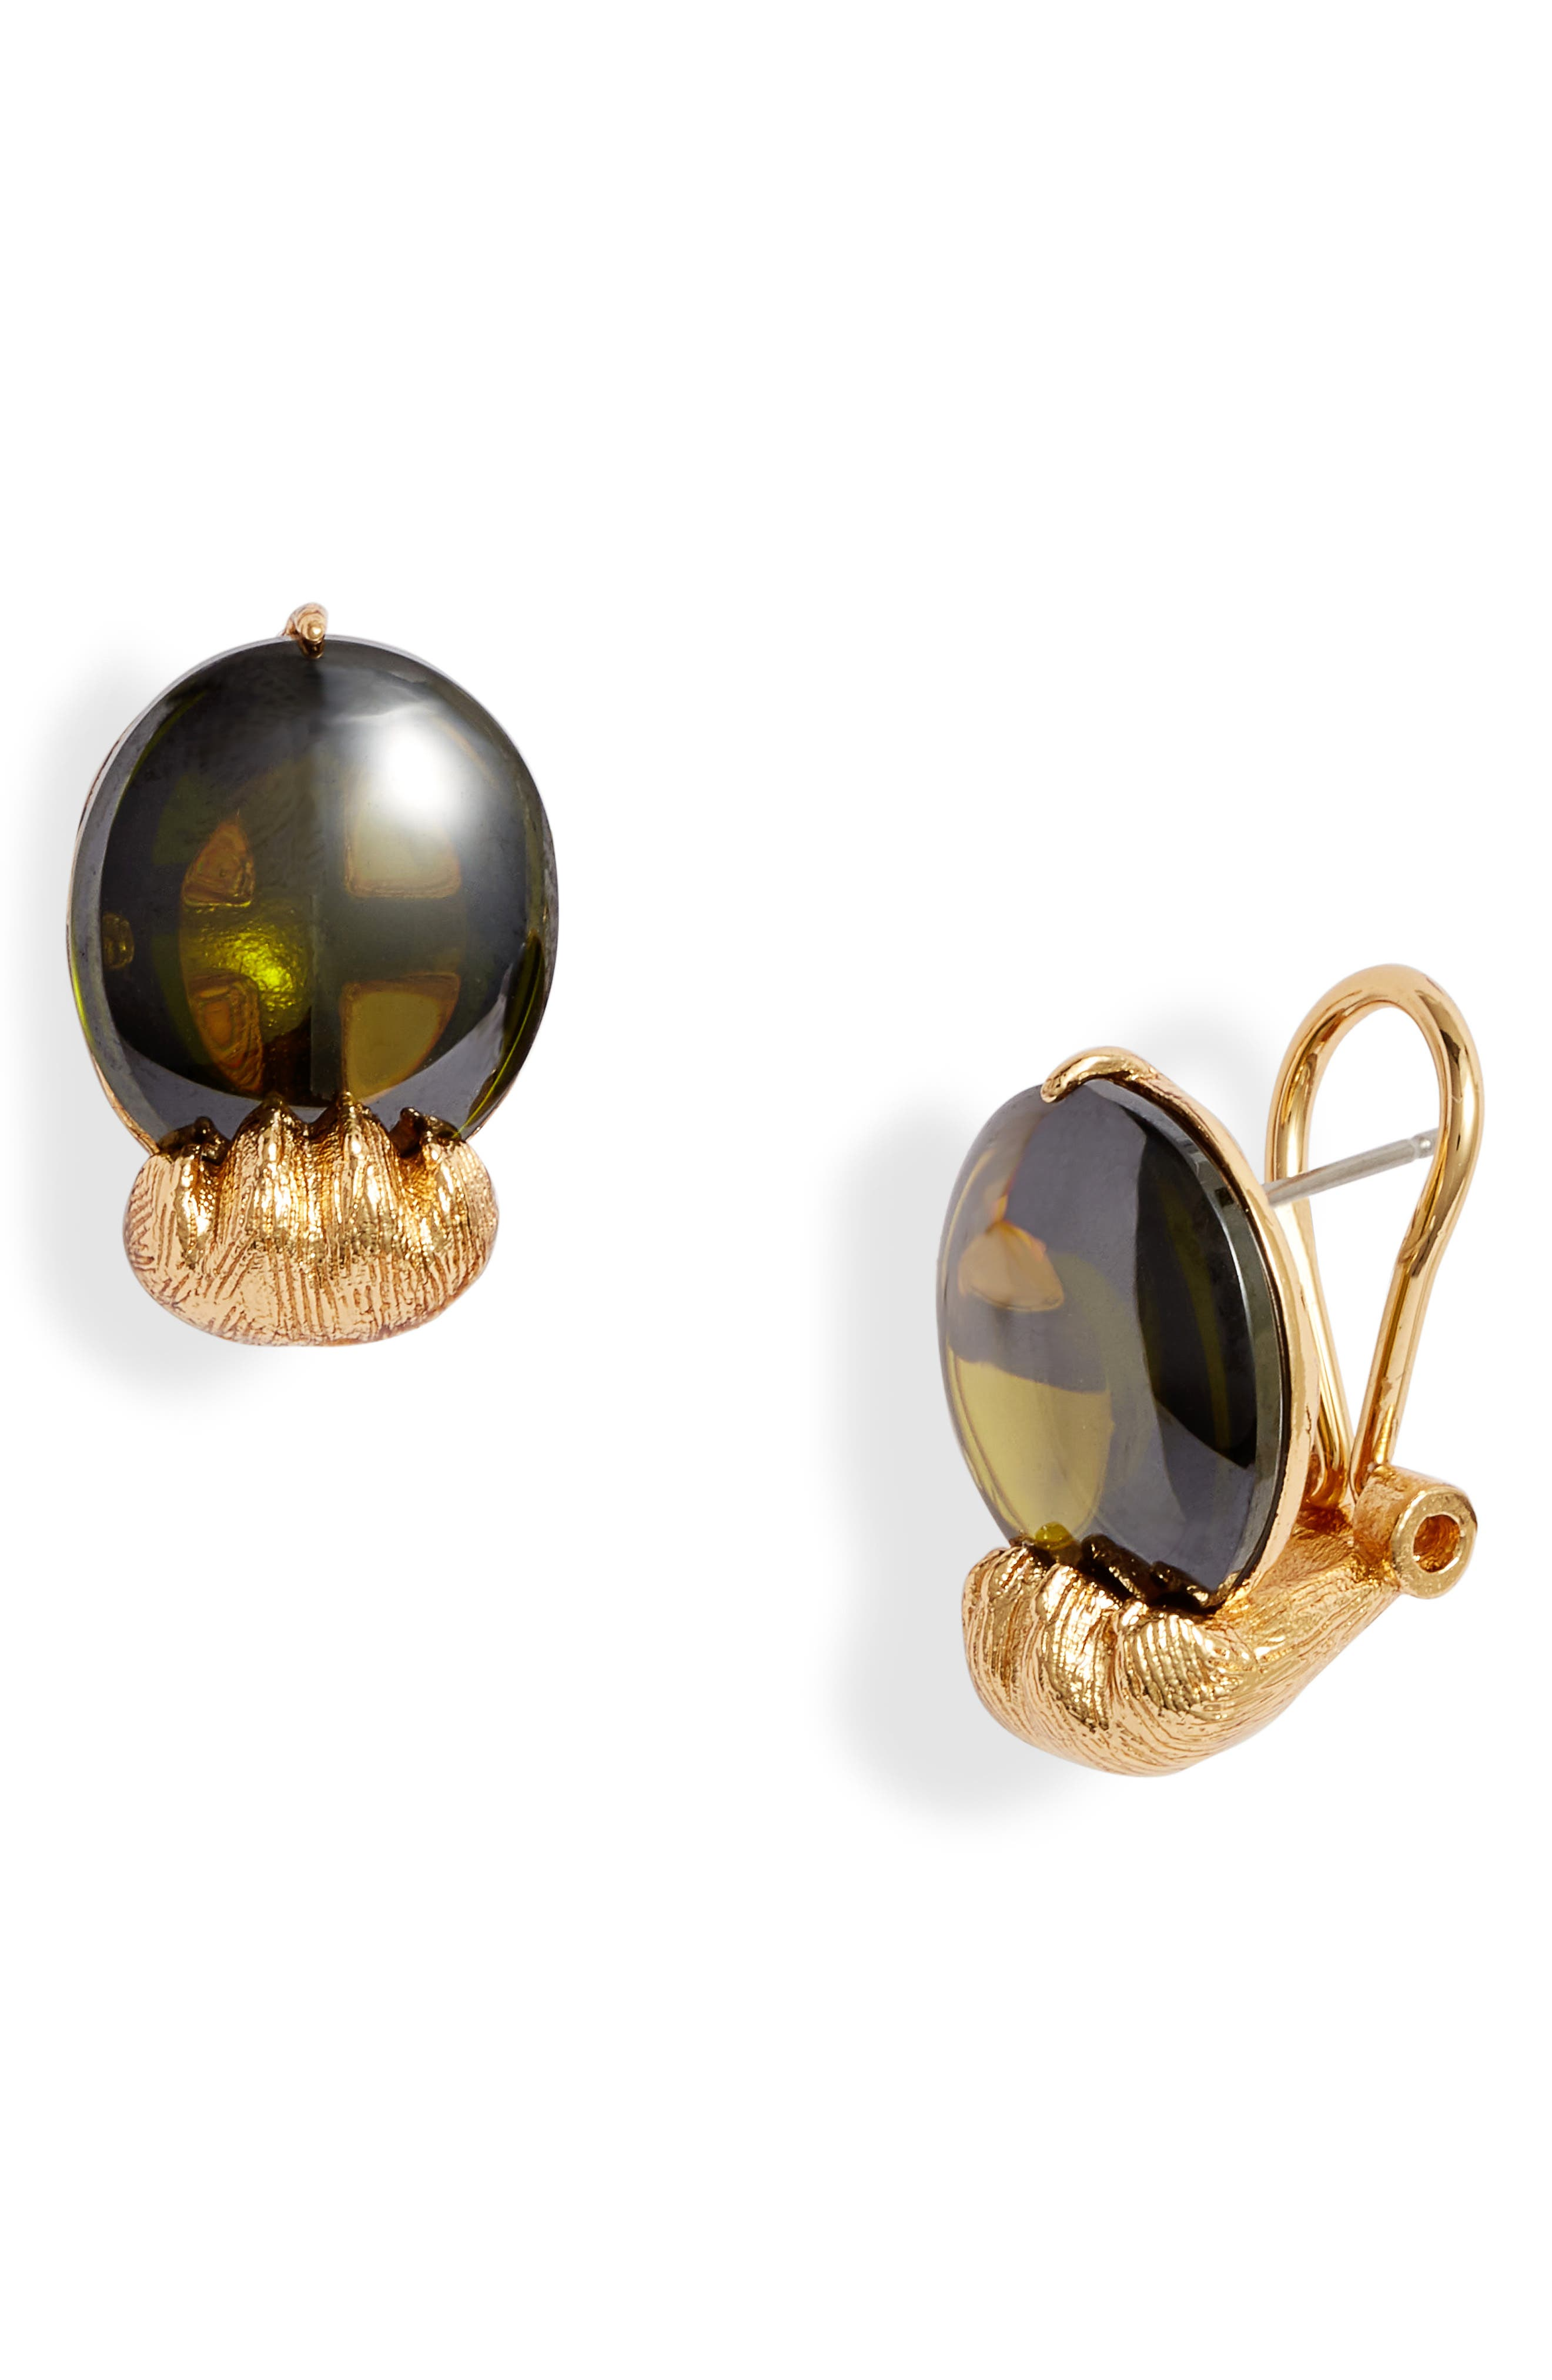 Kate Spade New York Jewelry house cat paw stud earrings